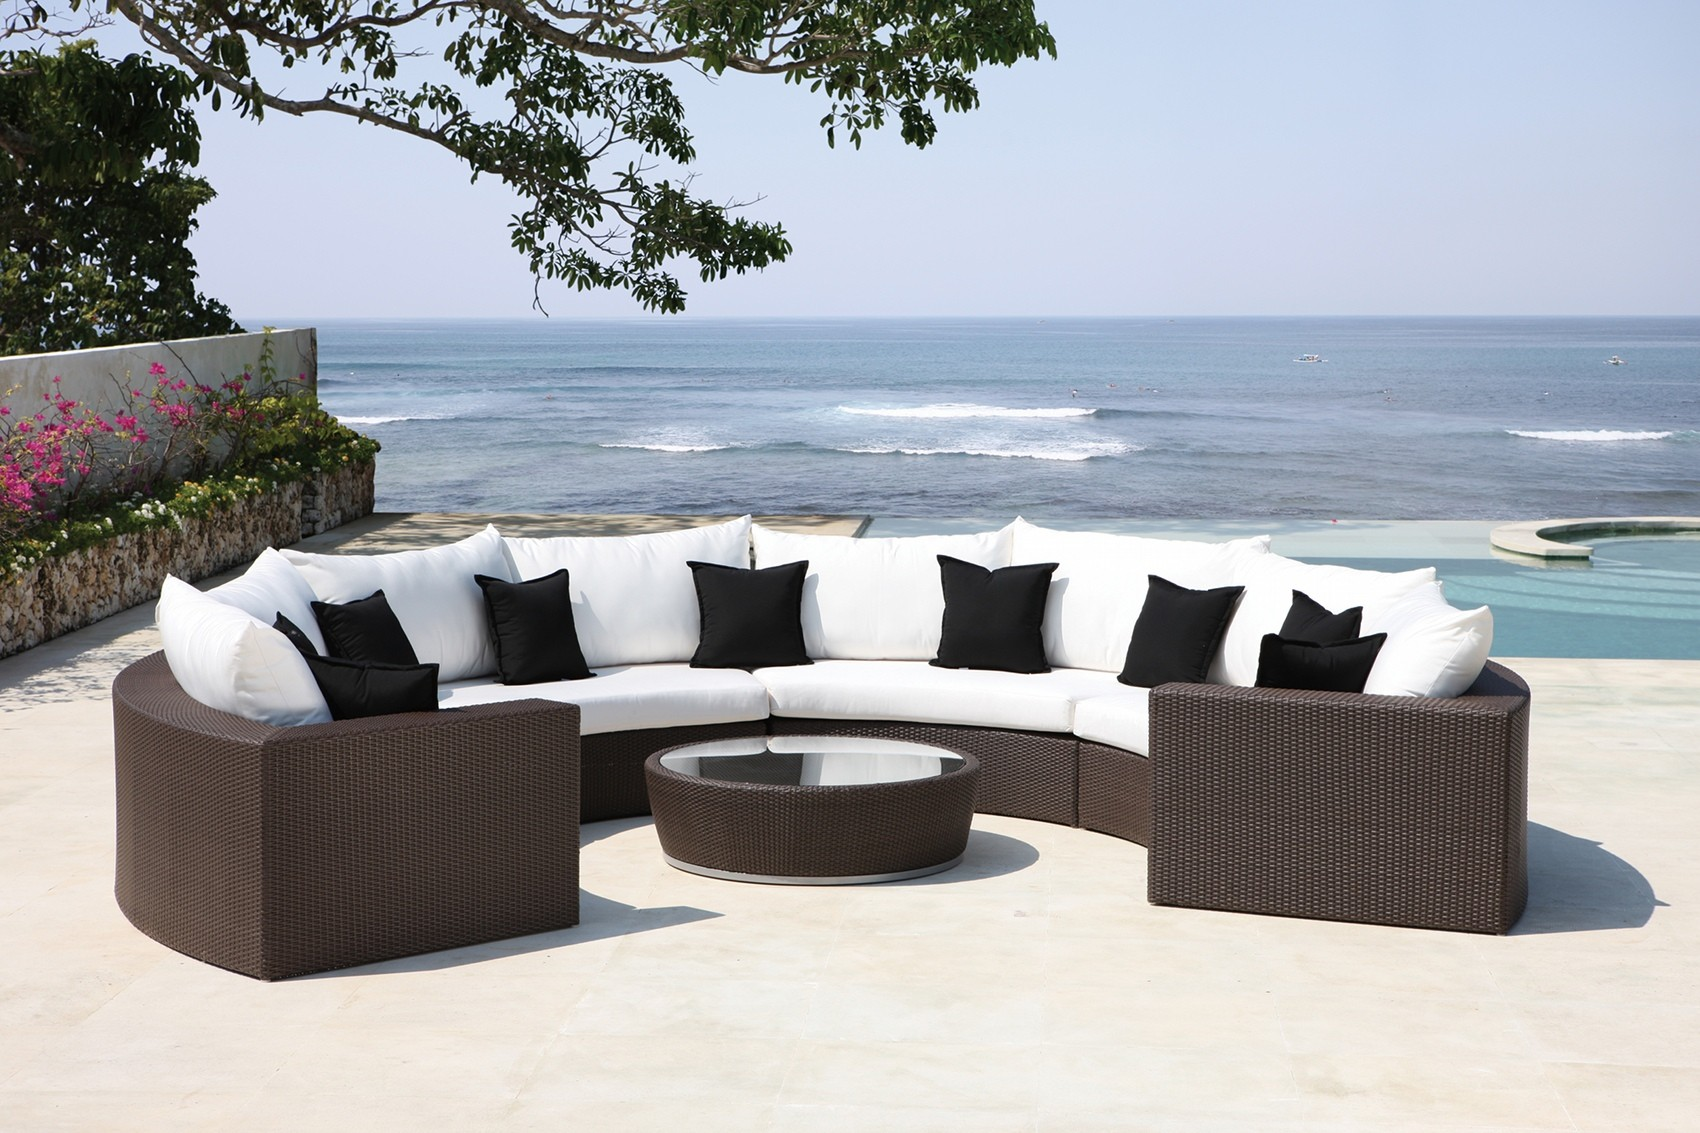 Discount Designer Outdoor Furniture Uk Perfect garden with modern